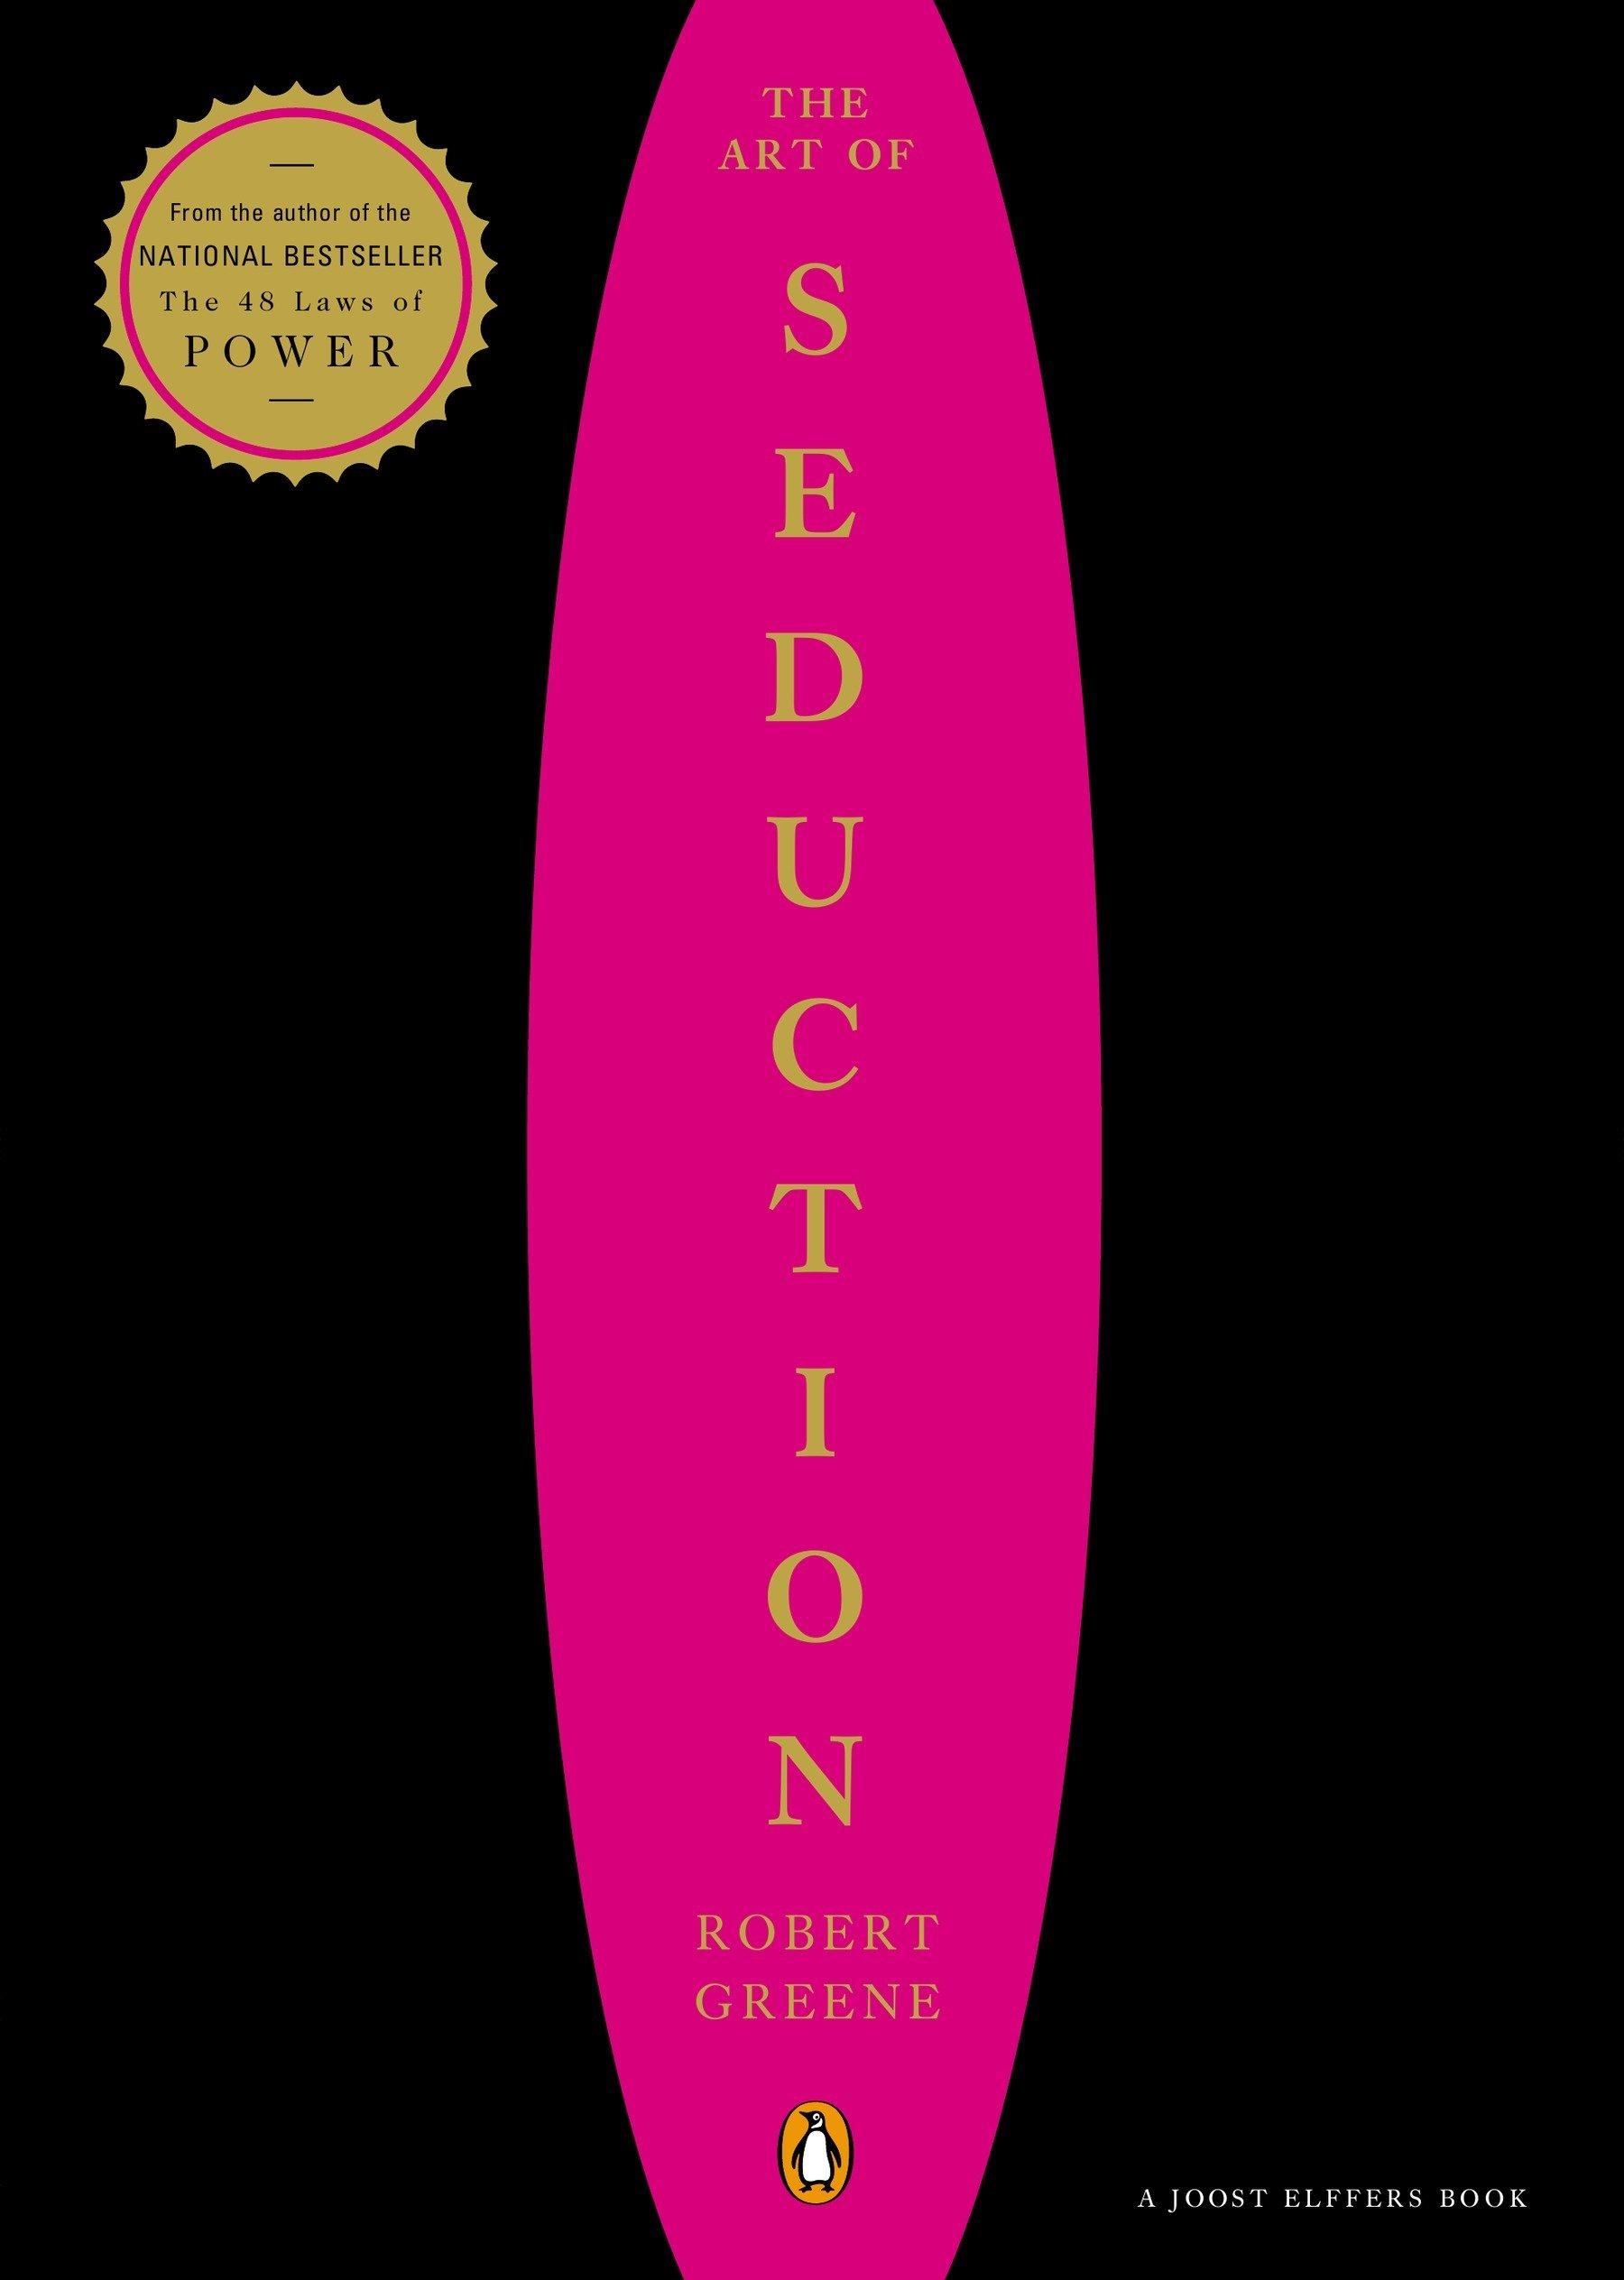 the-art-of-seduction-robert-greene-book-cover.jpg